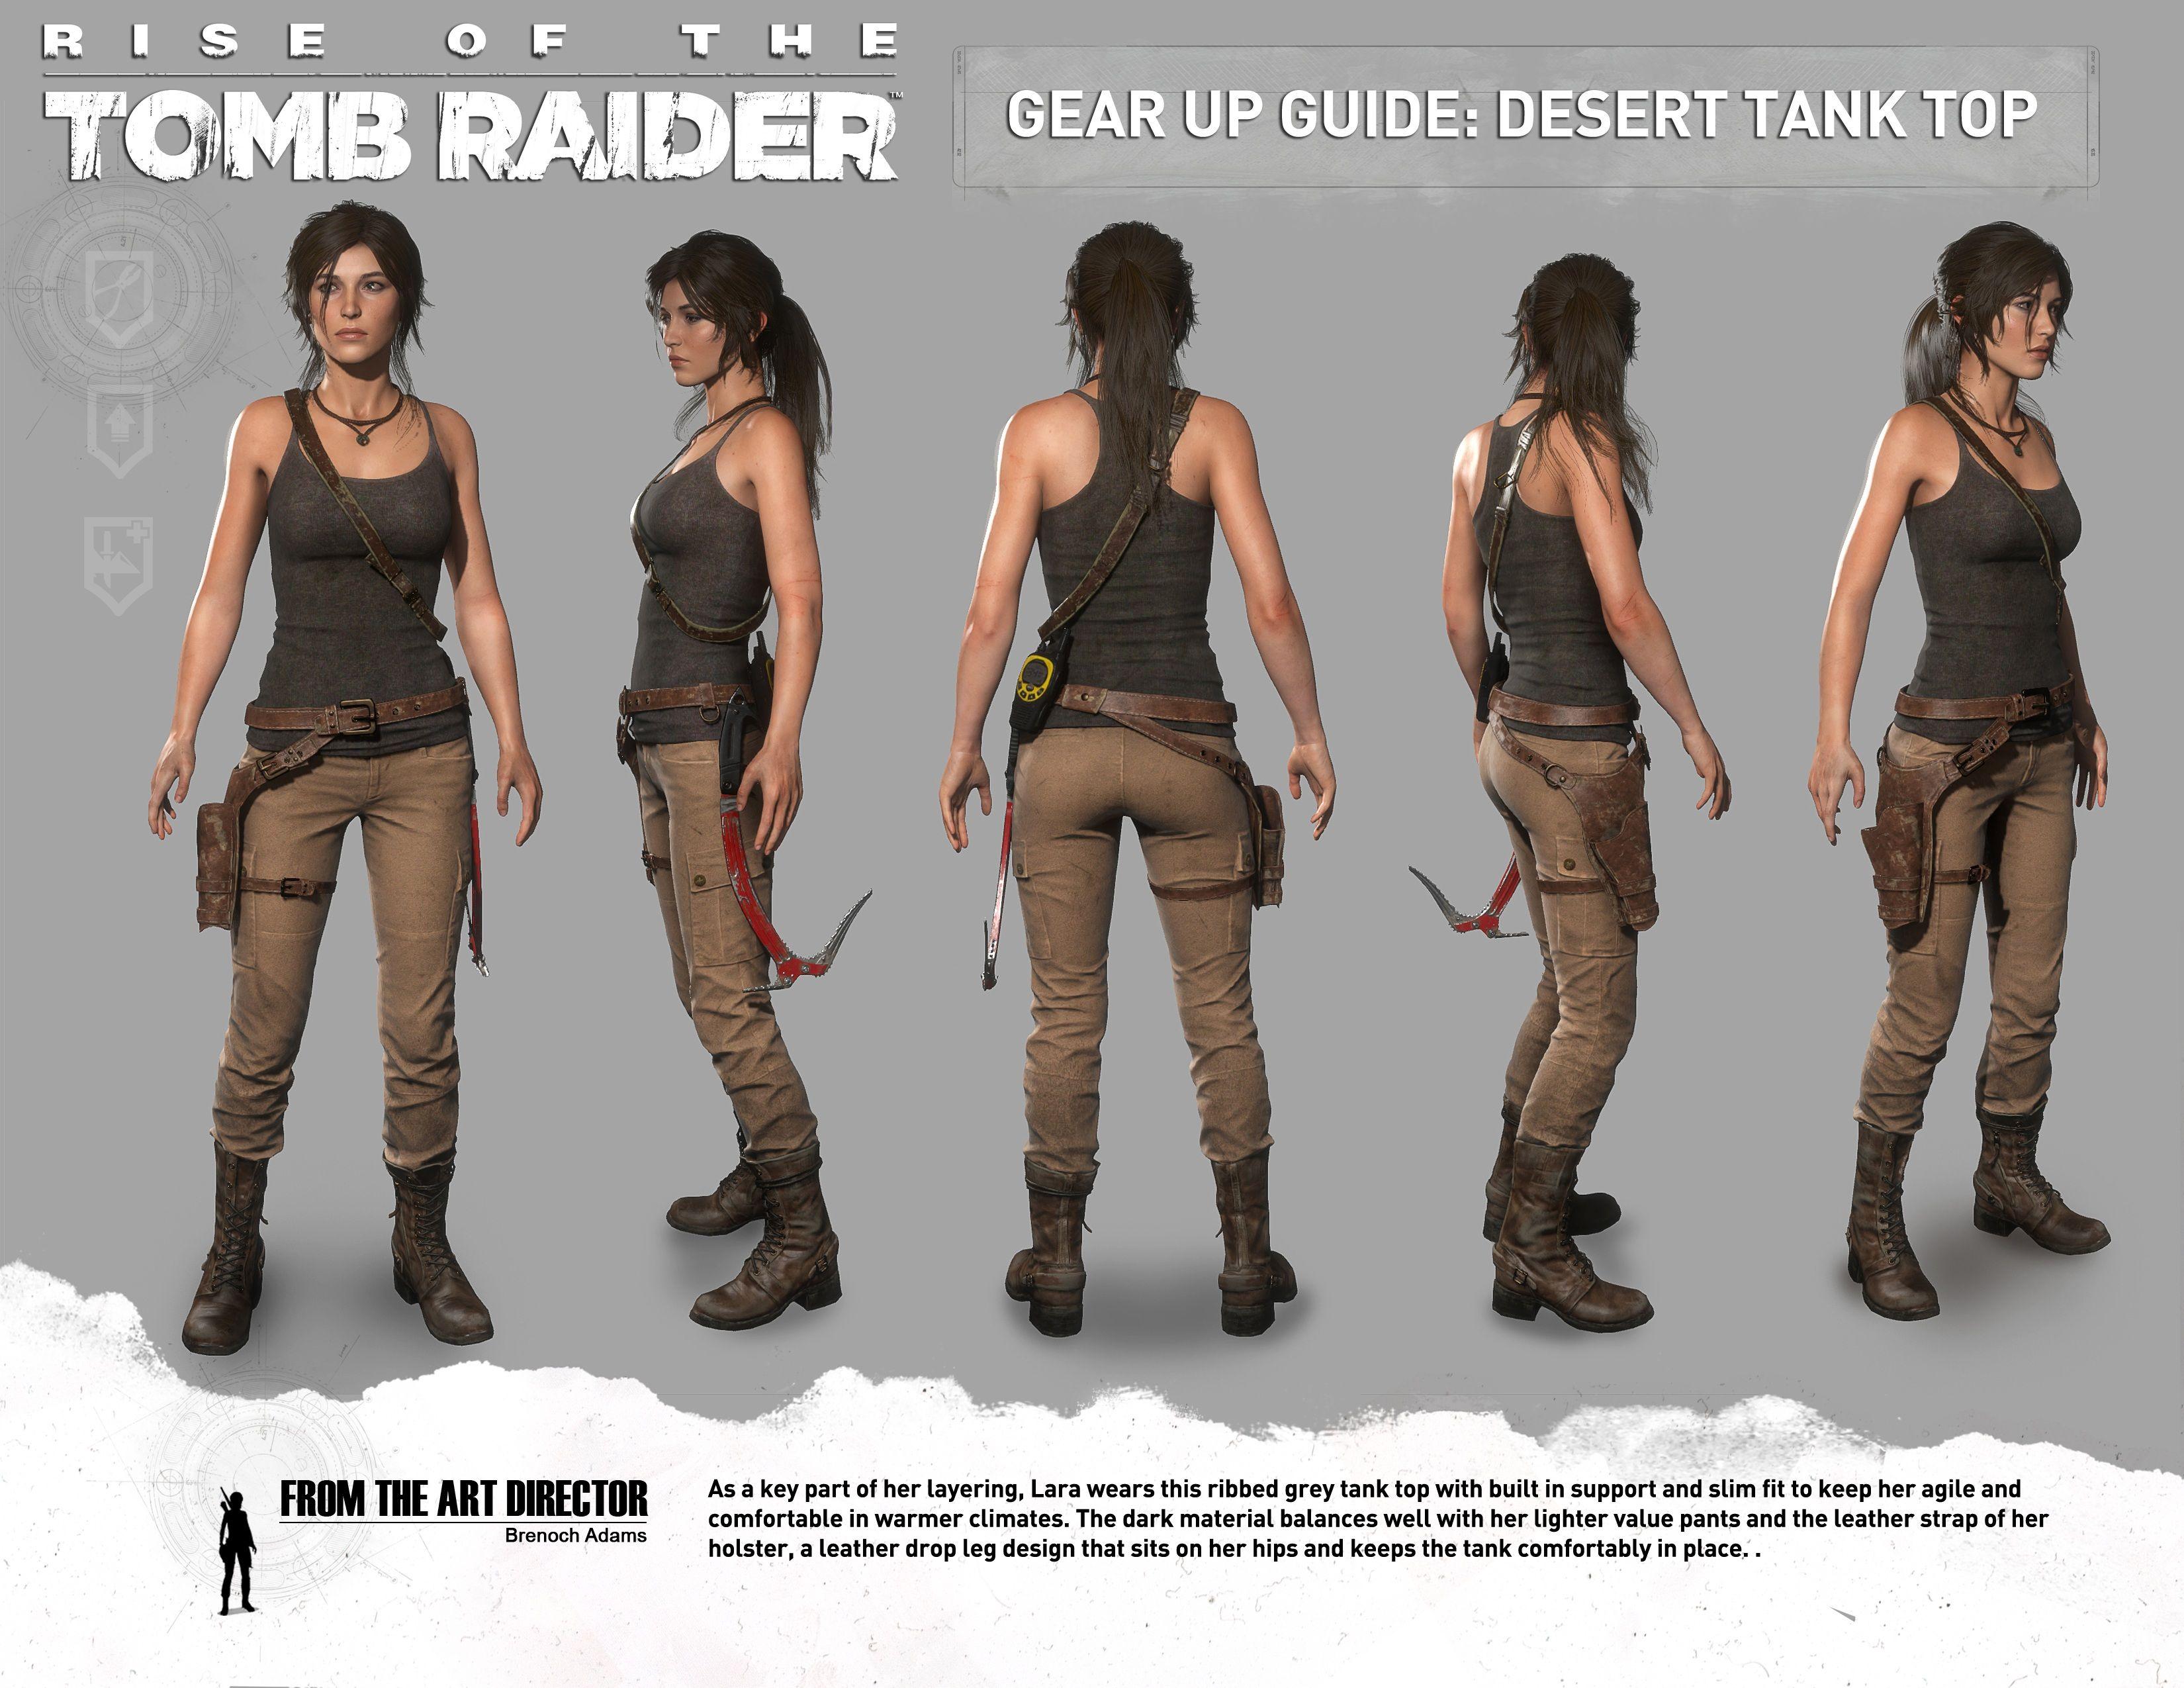 Riseofthetombraiderdeserttanktop Jpg 3300 2550 Tomb Raider Lara Croft Costume Tomb Raider Outfits